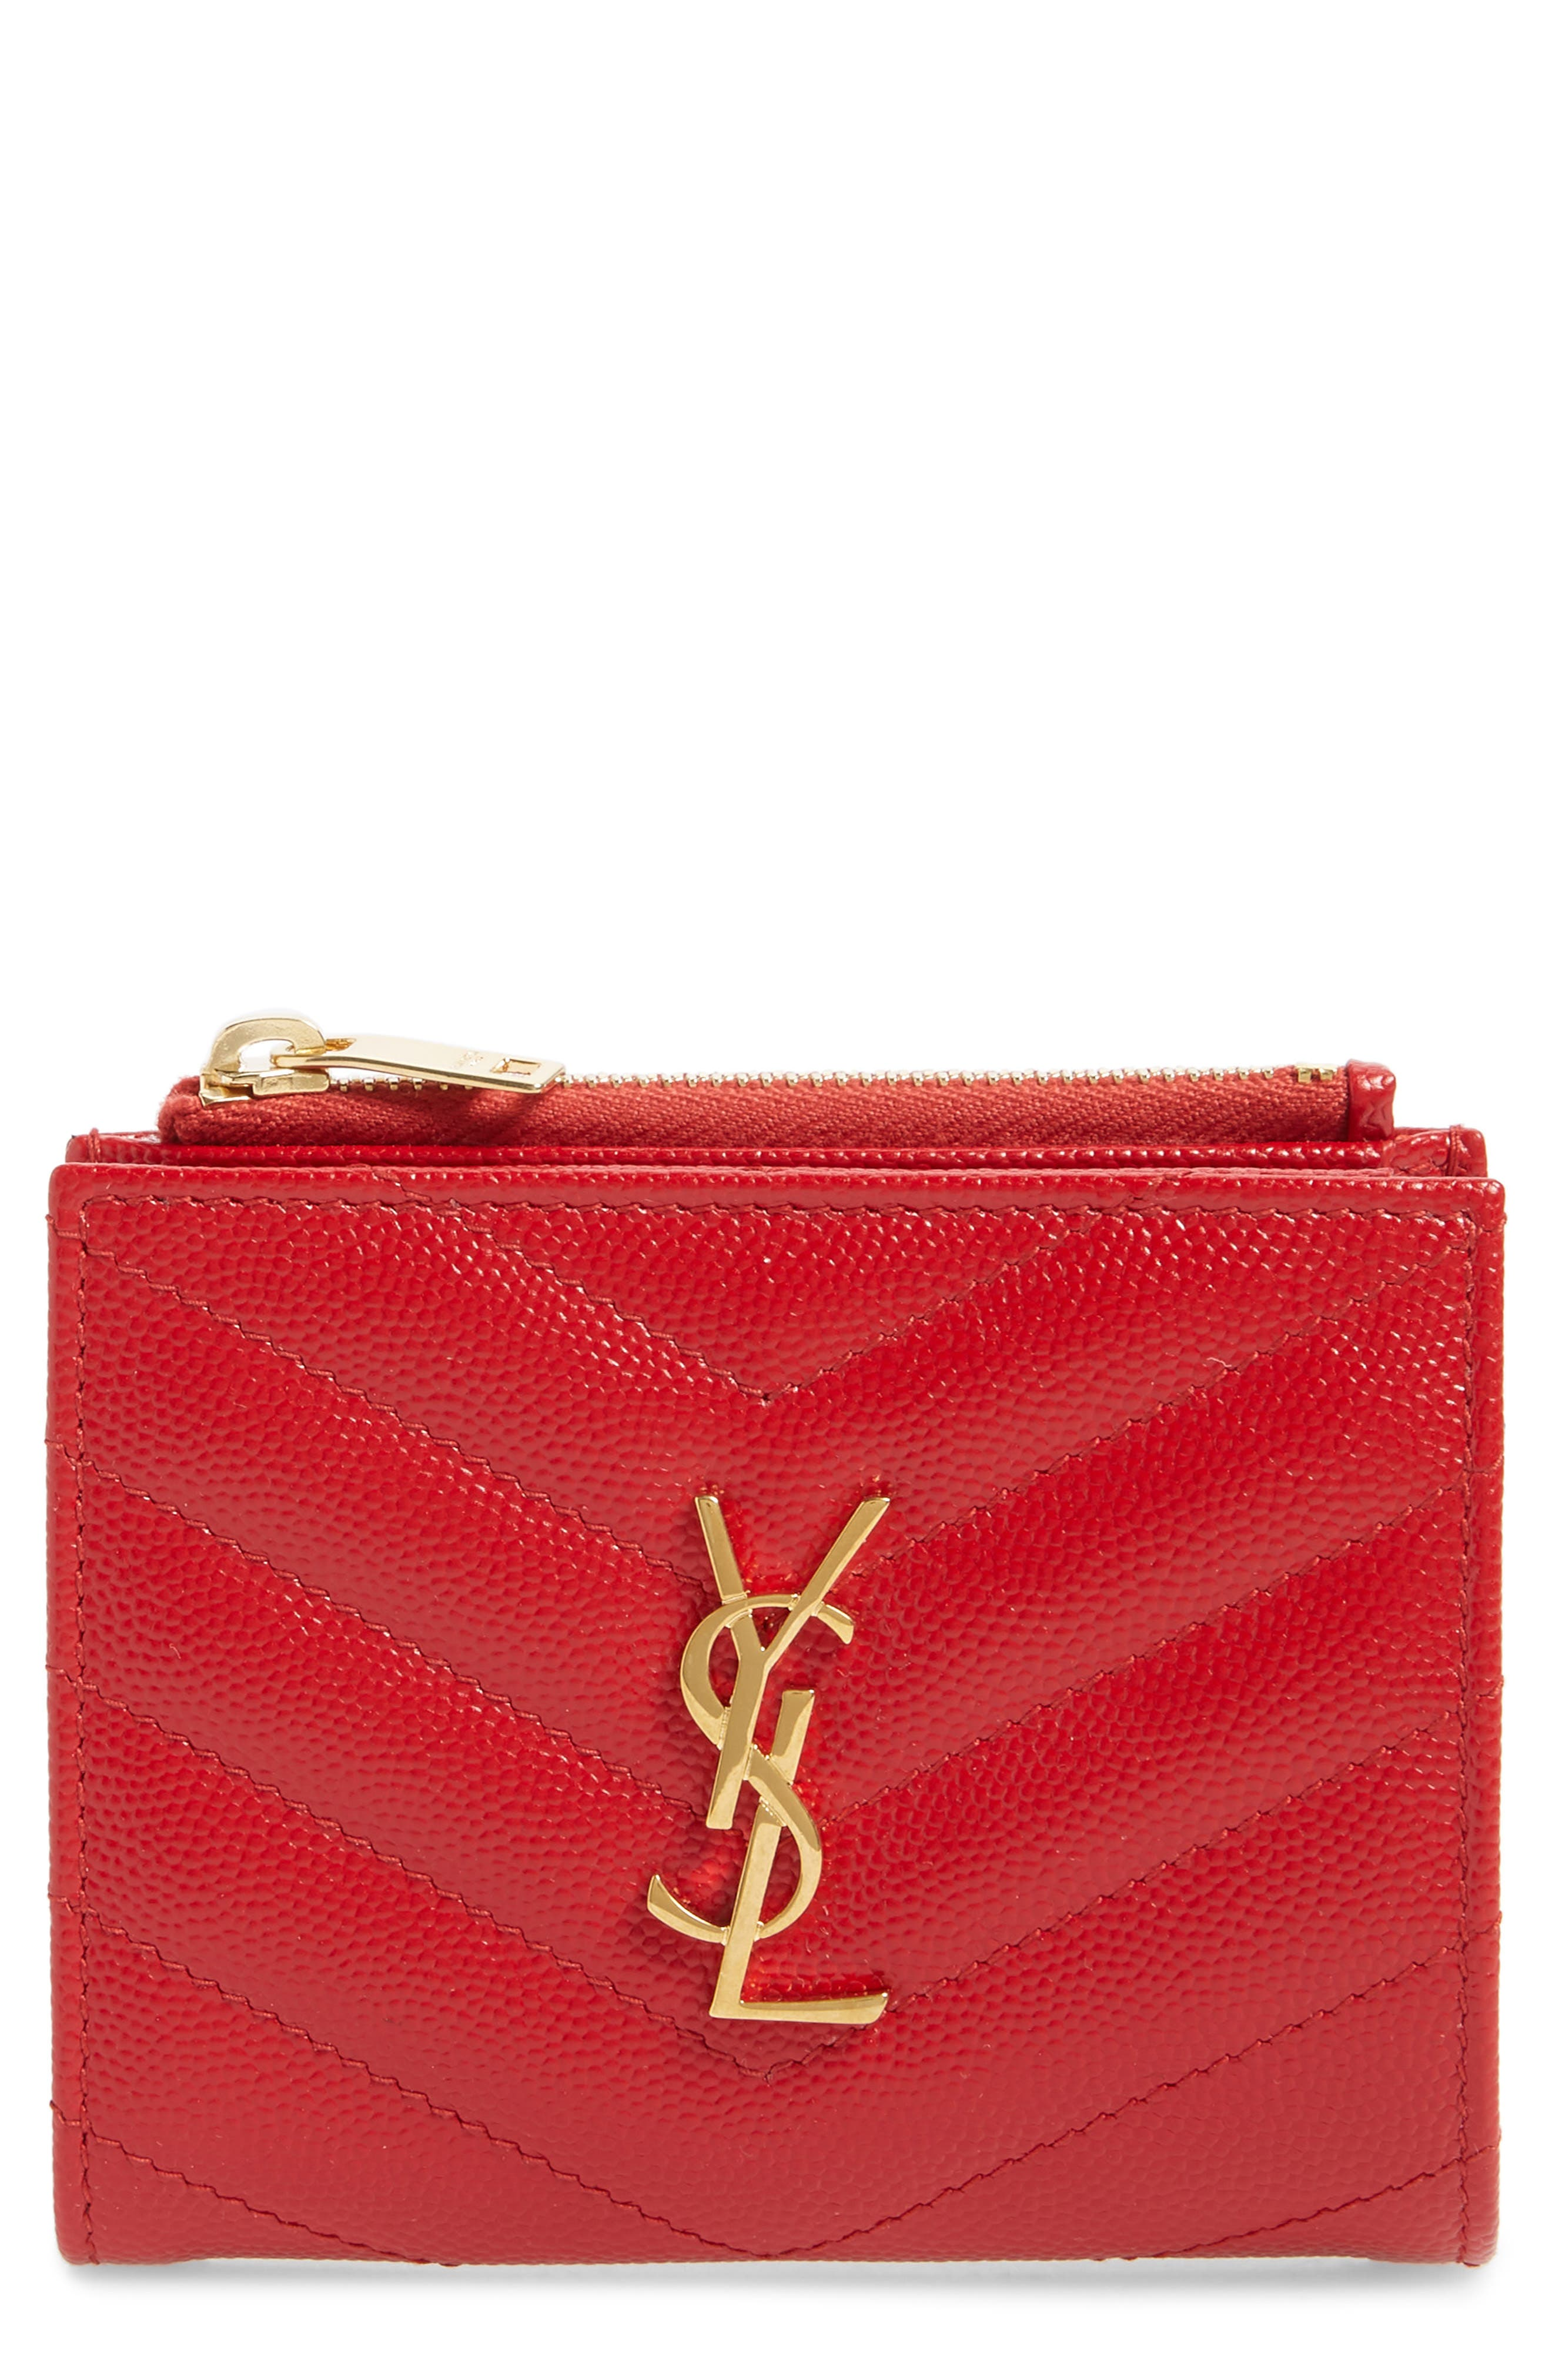 Monogram Leather Card Case,                         Main,                         color, BANDANA RED